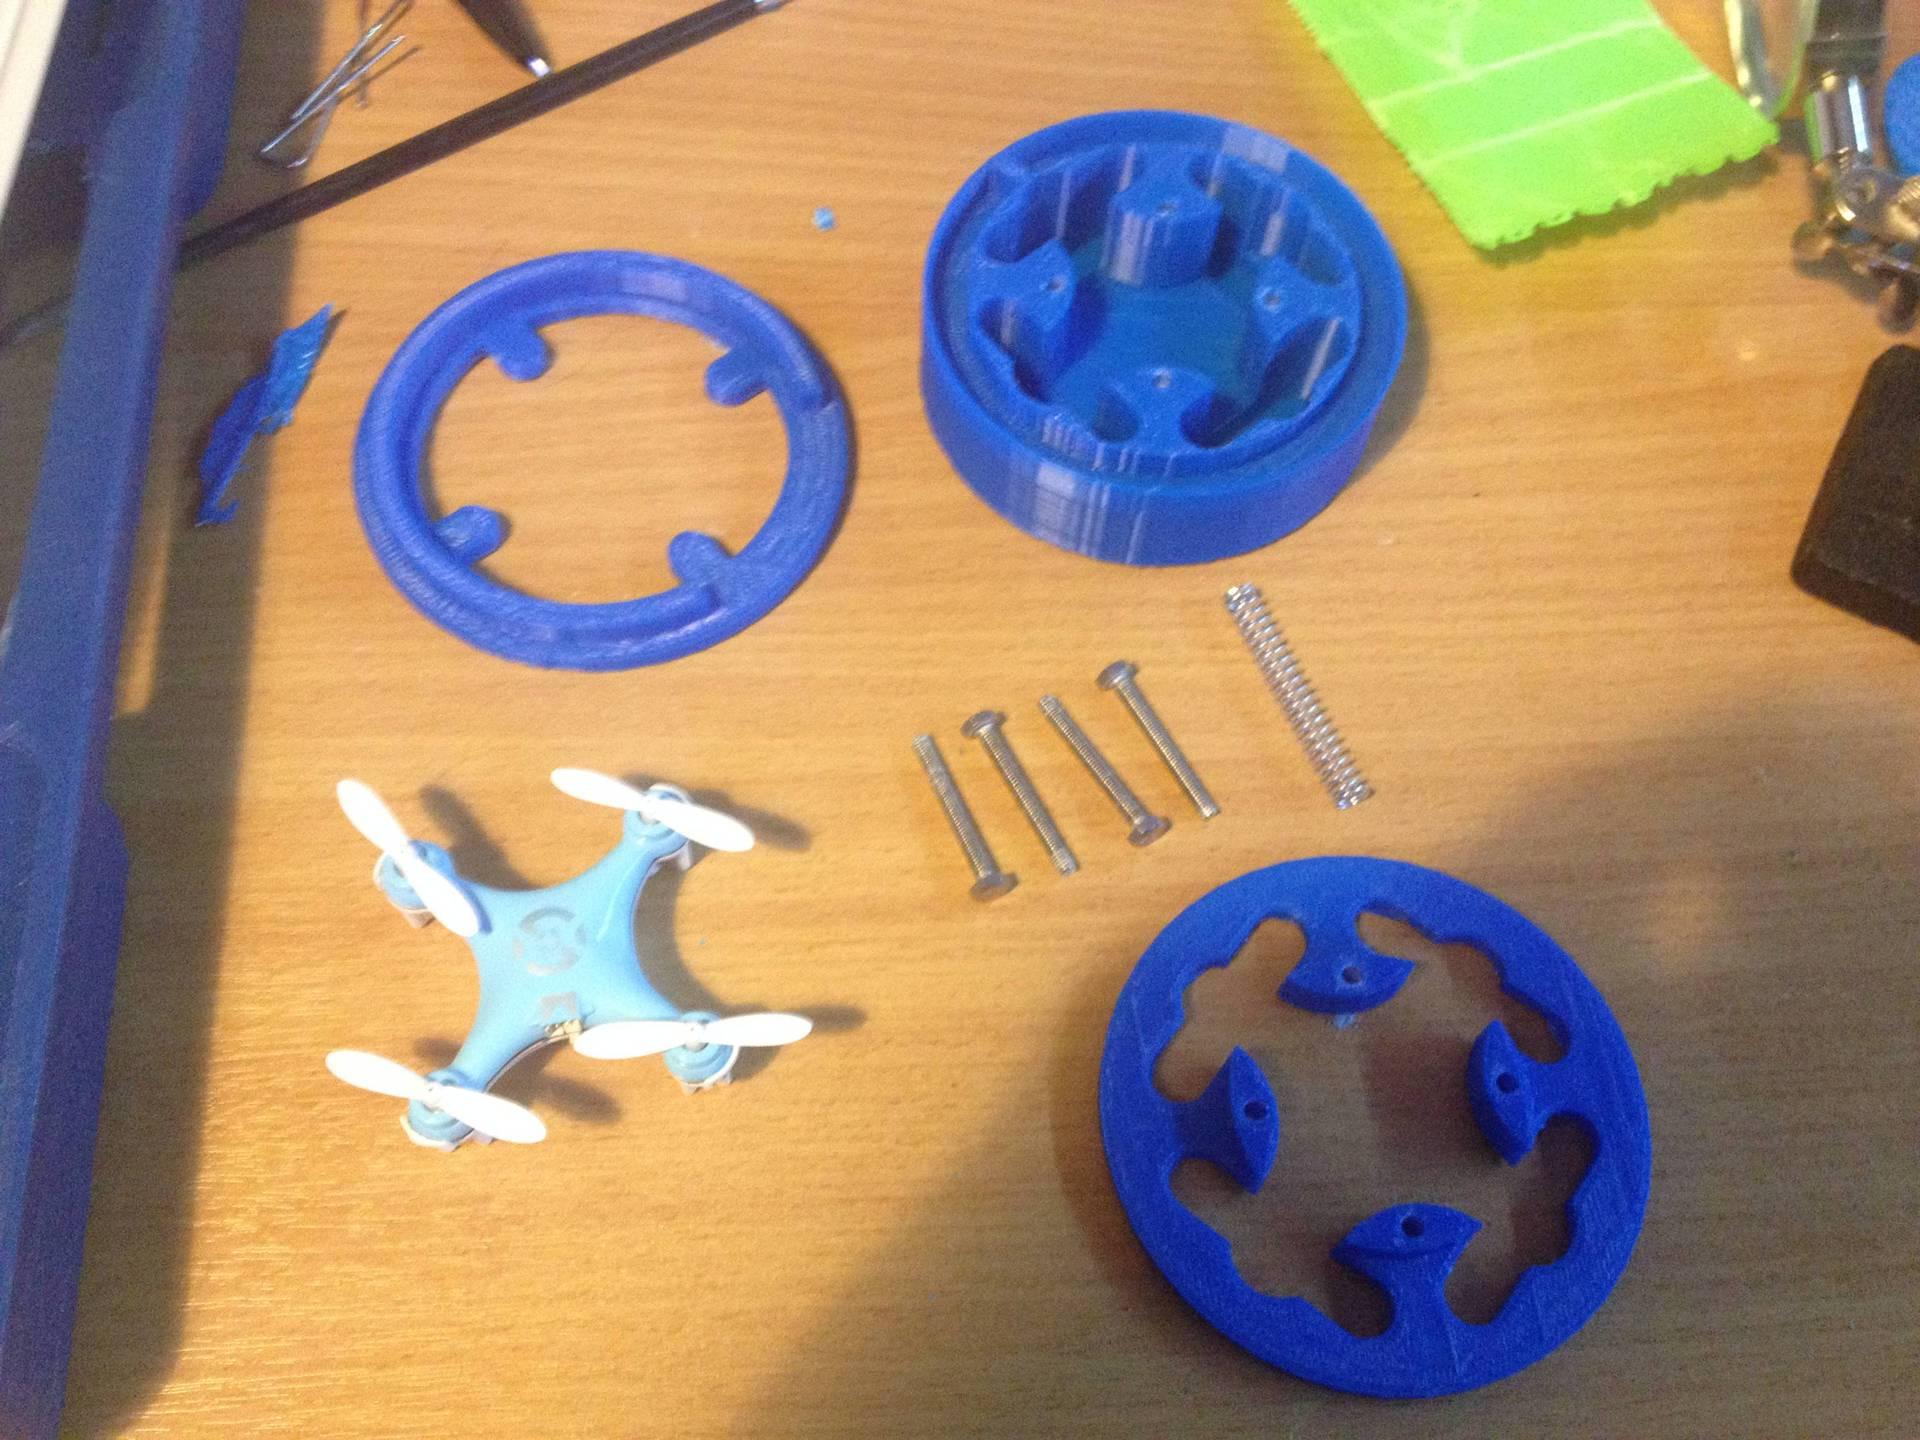 Карманный кейс на 3D принтере для мини-квадрокоптера Cheerson CX-10 - 2